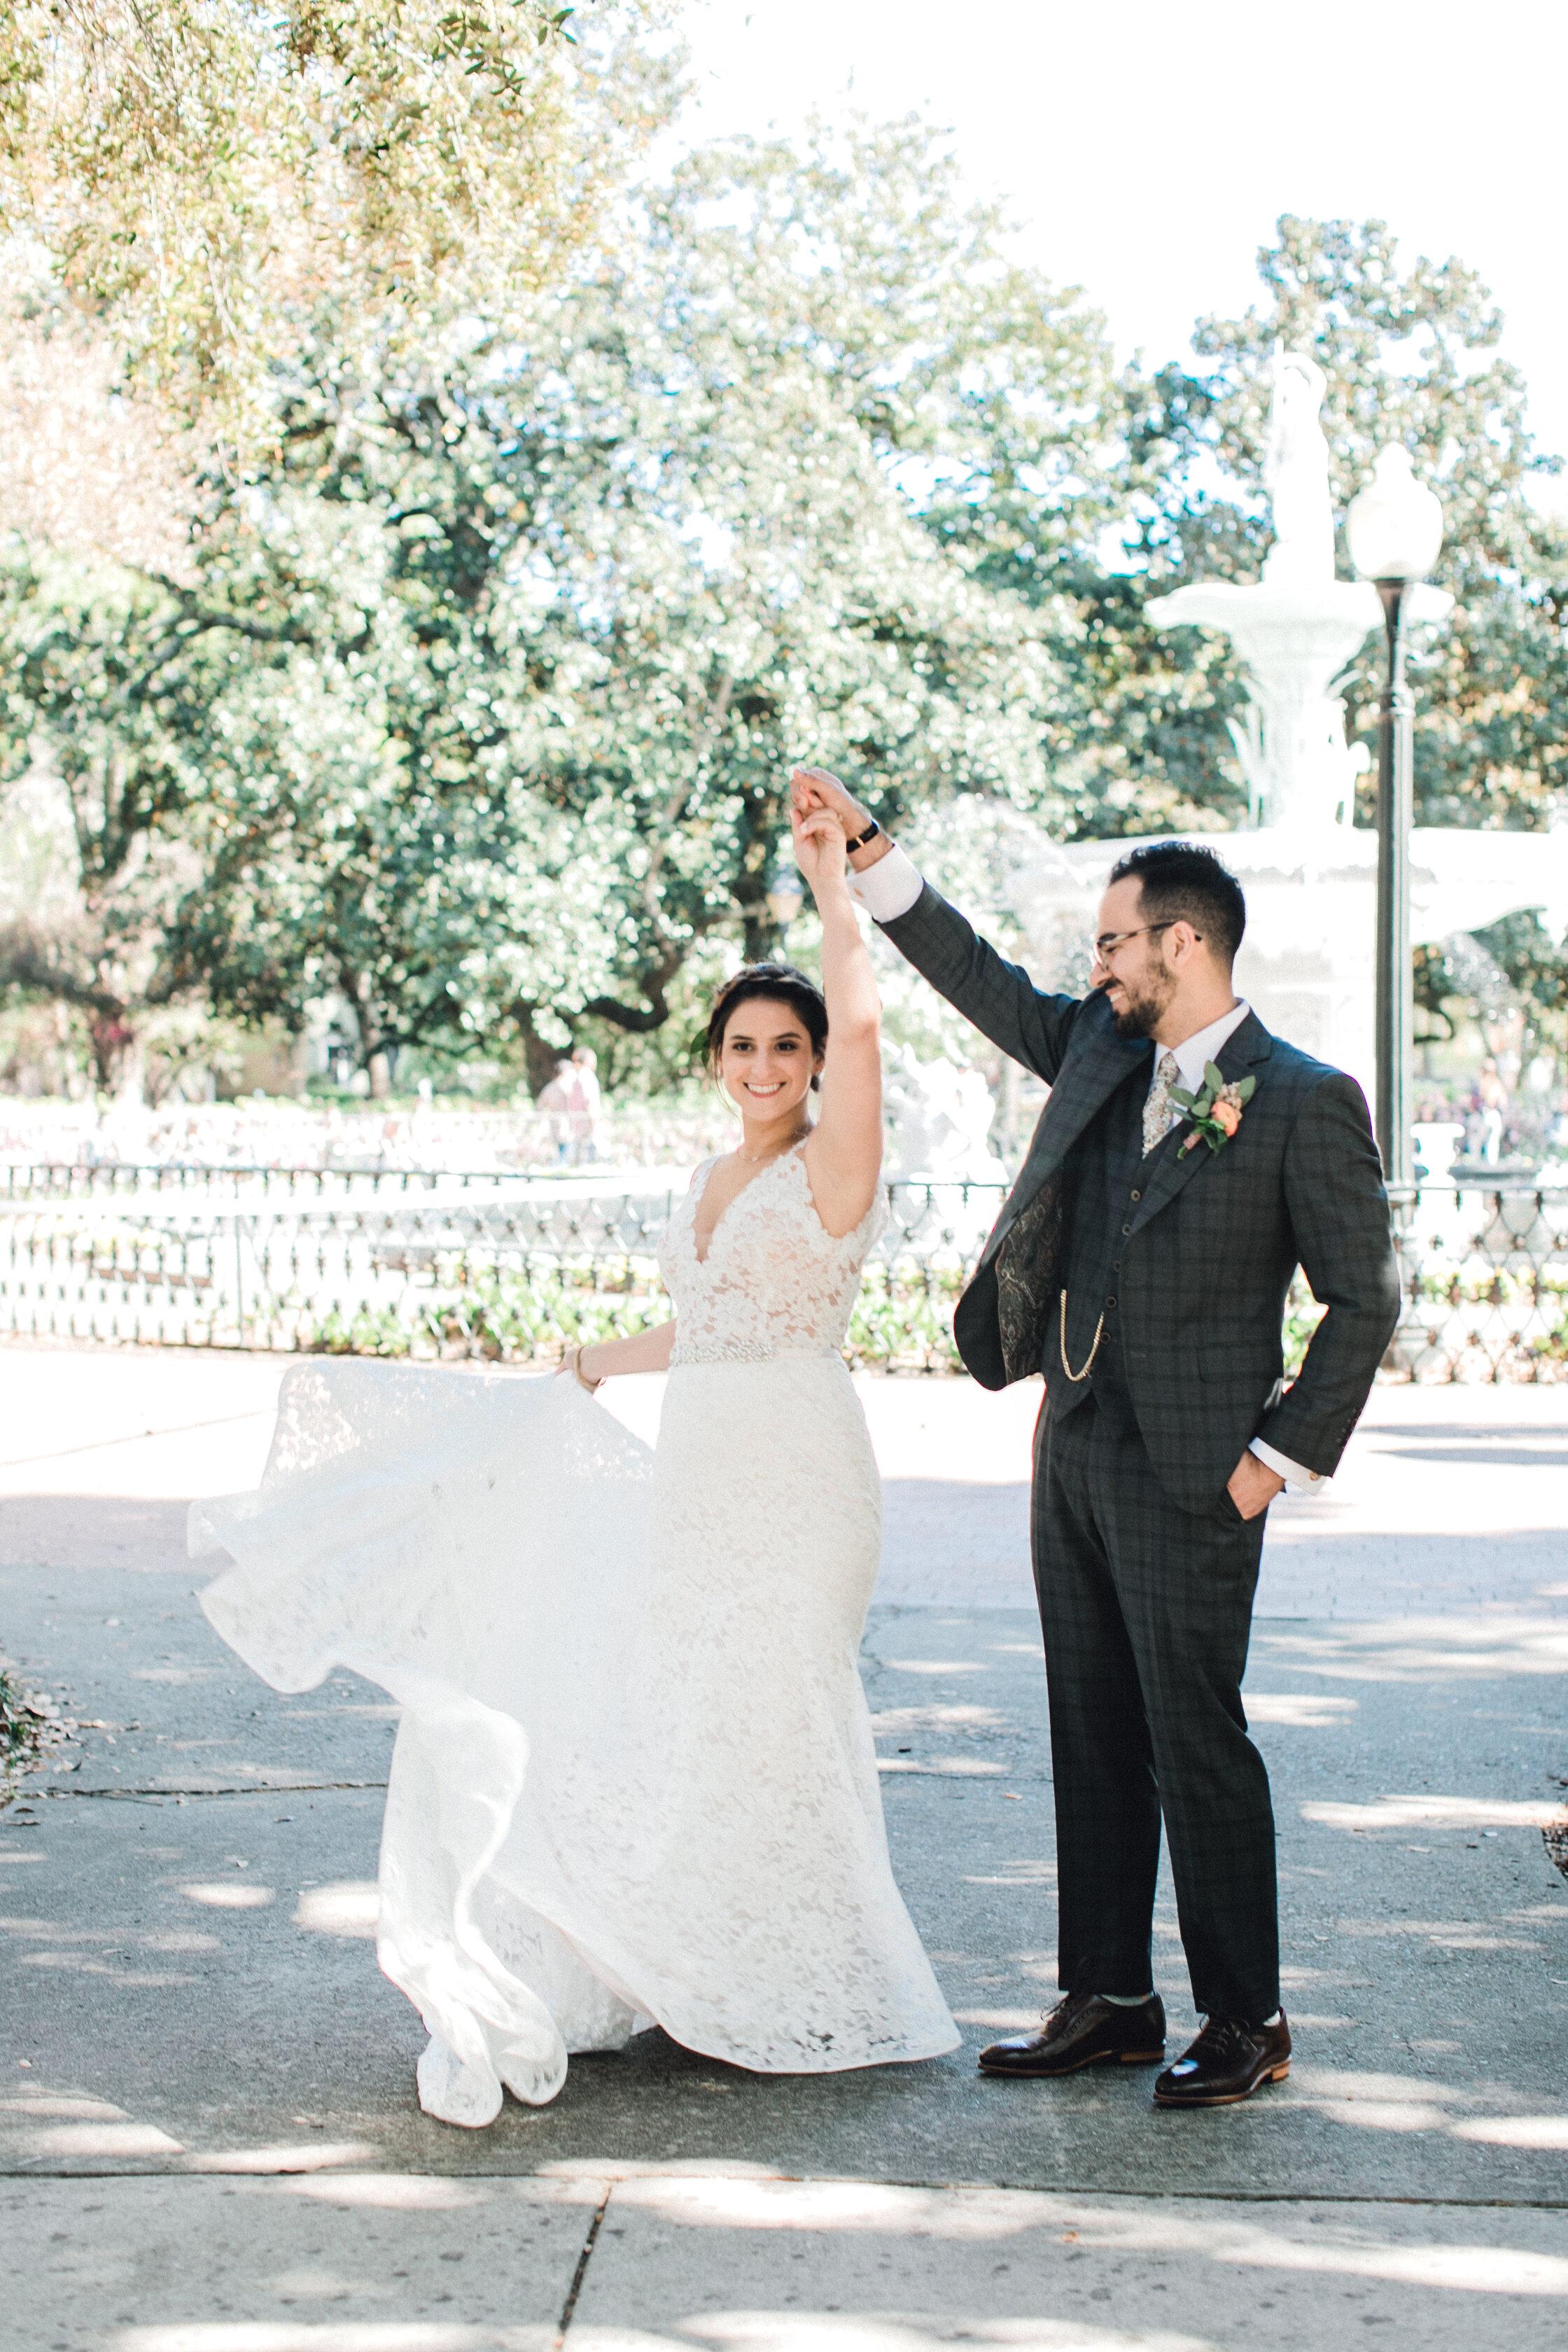 ivory-and-beau-blog-weddings-ivory-and-beau-couple-dominique-and-andres-savannah-florist-wedding-planning-savannah-bridal-boutique-wedding-flowers-KIP_WEBERWEDDING_RAILROADMUSEUM-684.JPG